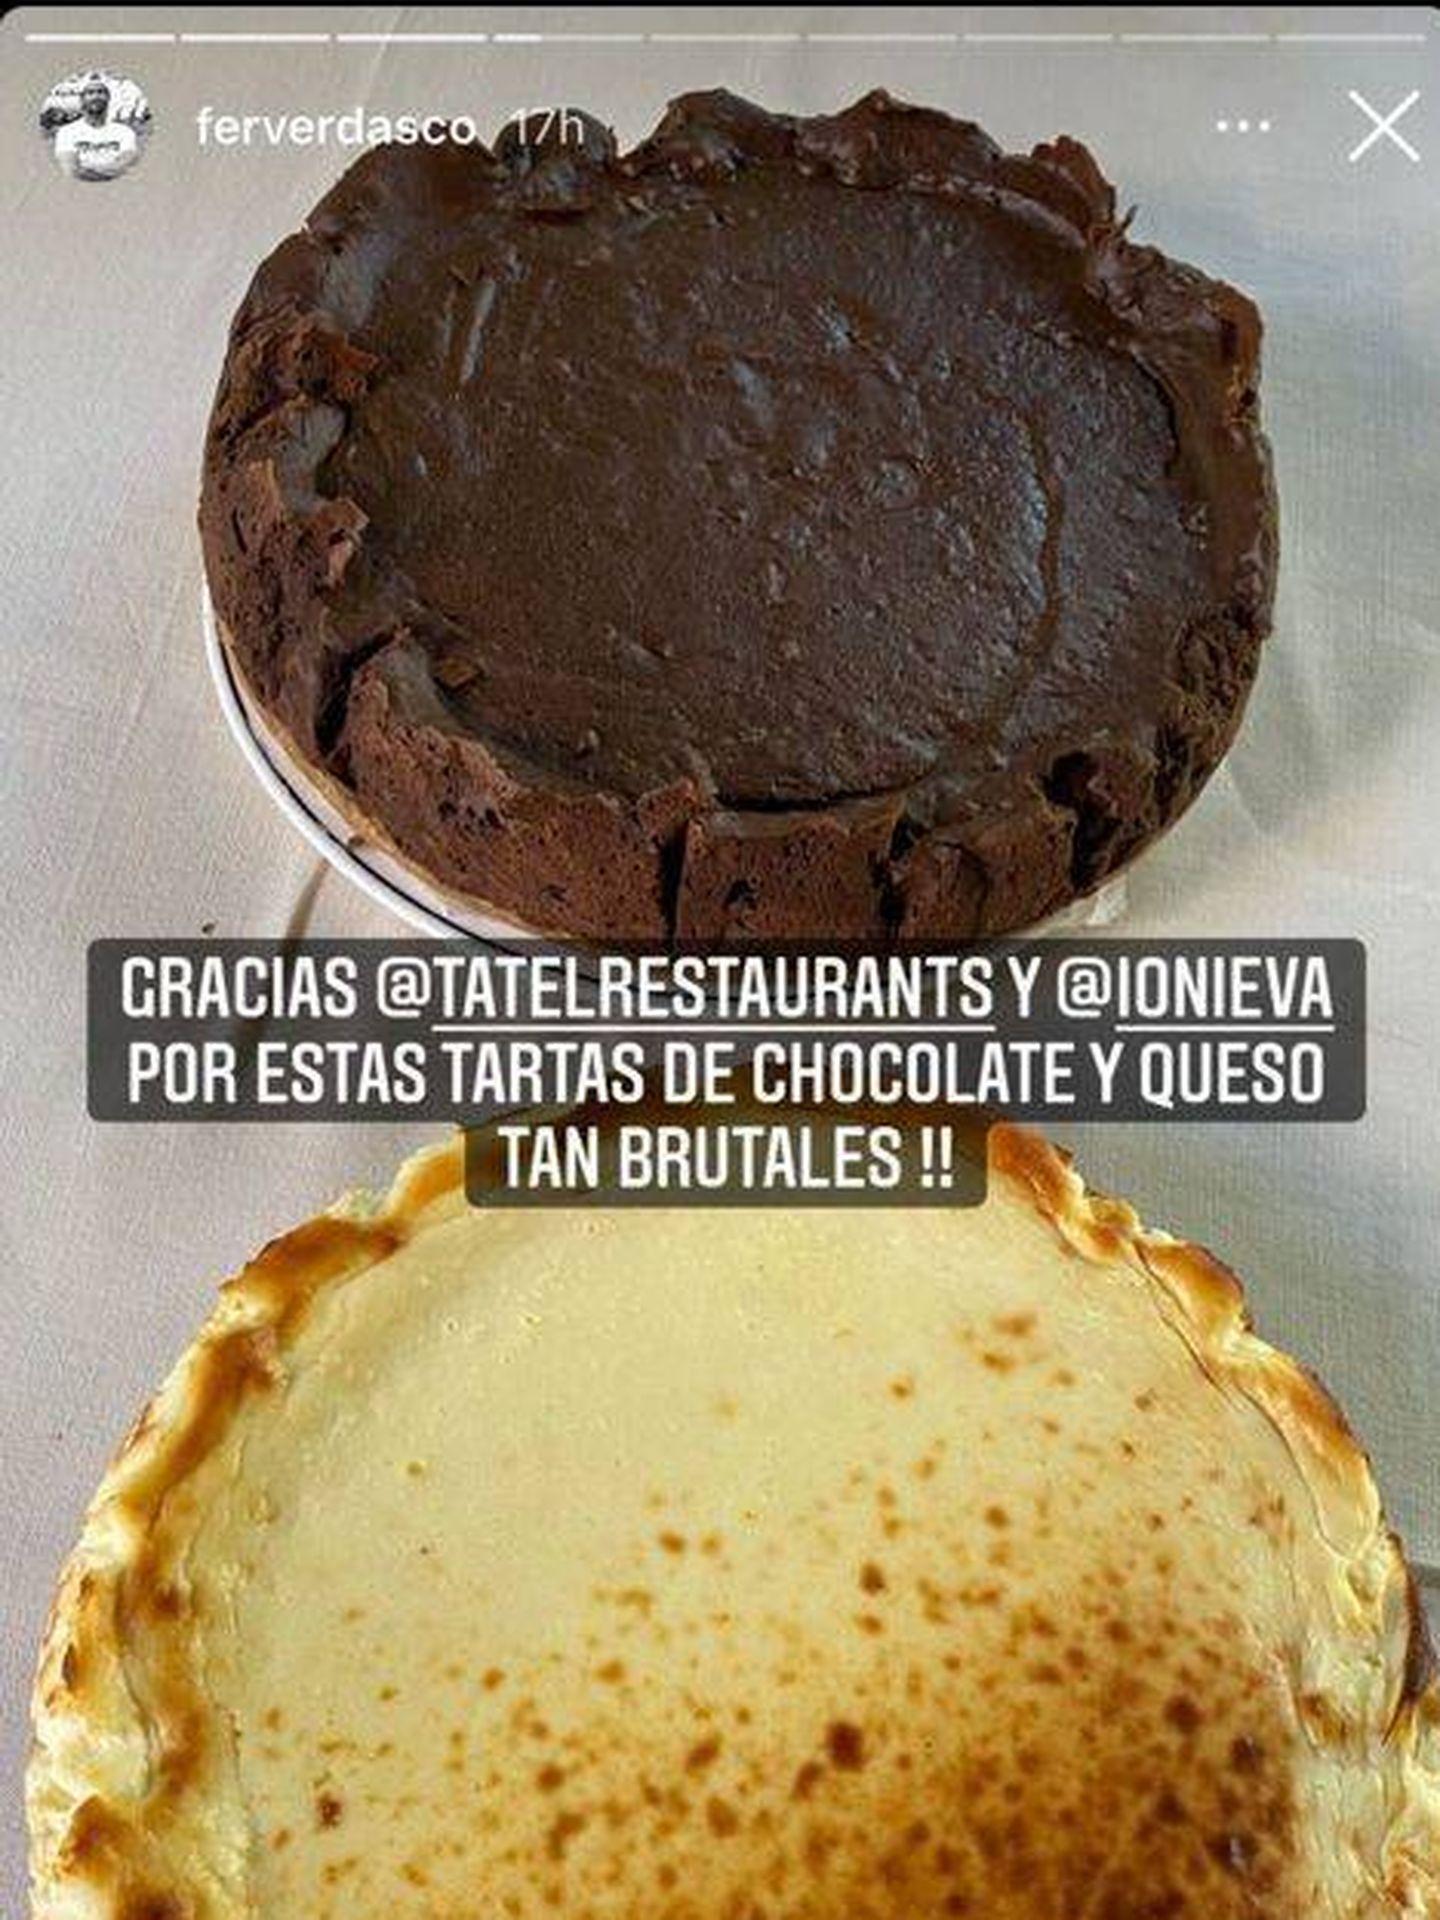 Tartas de Ana Boyer compartidas por Verdasco. (Redes)